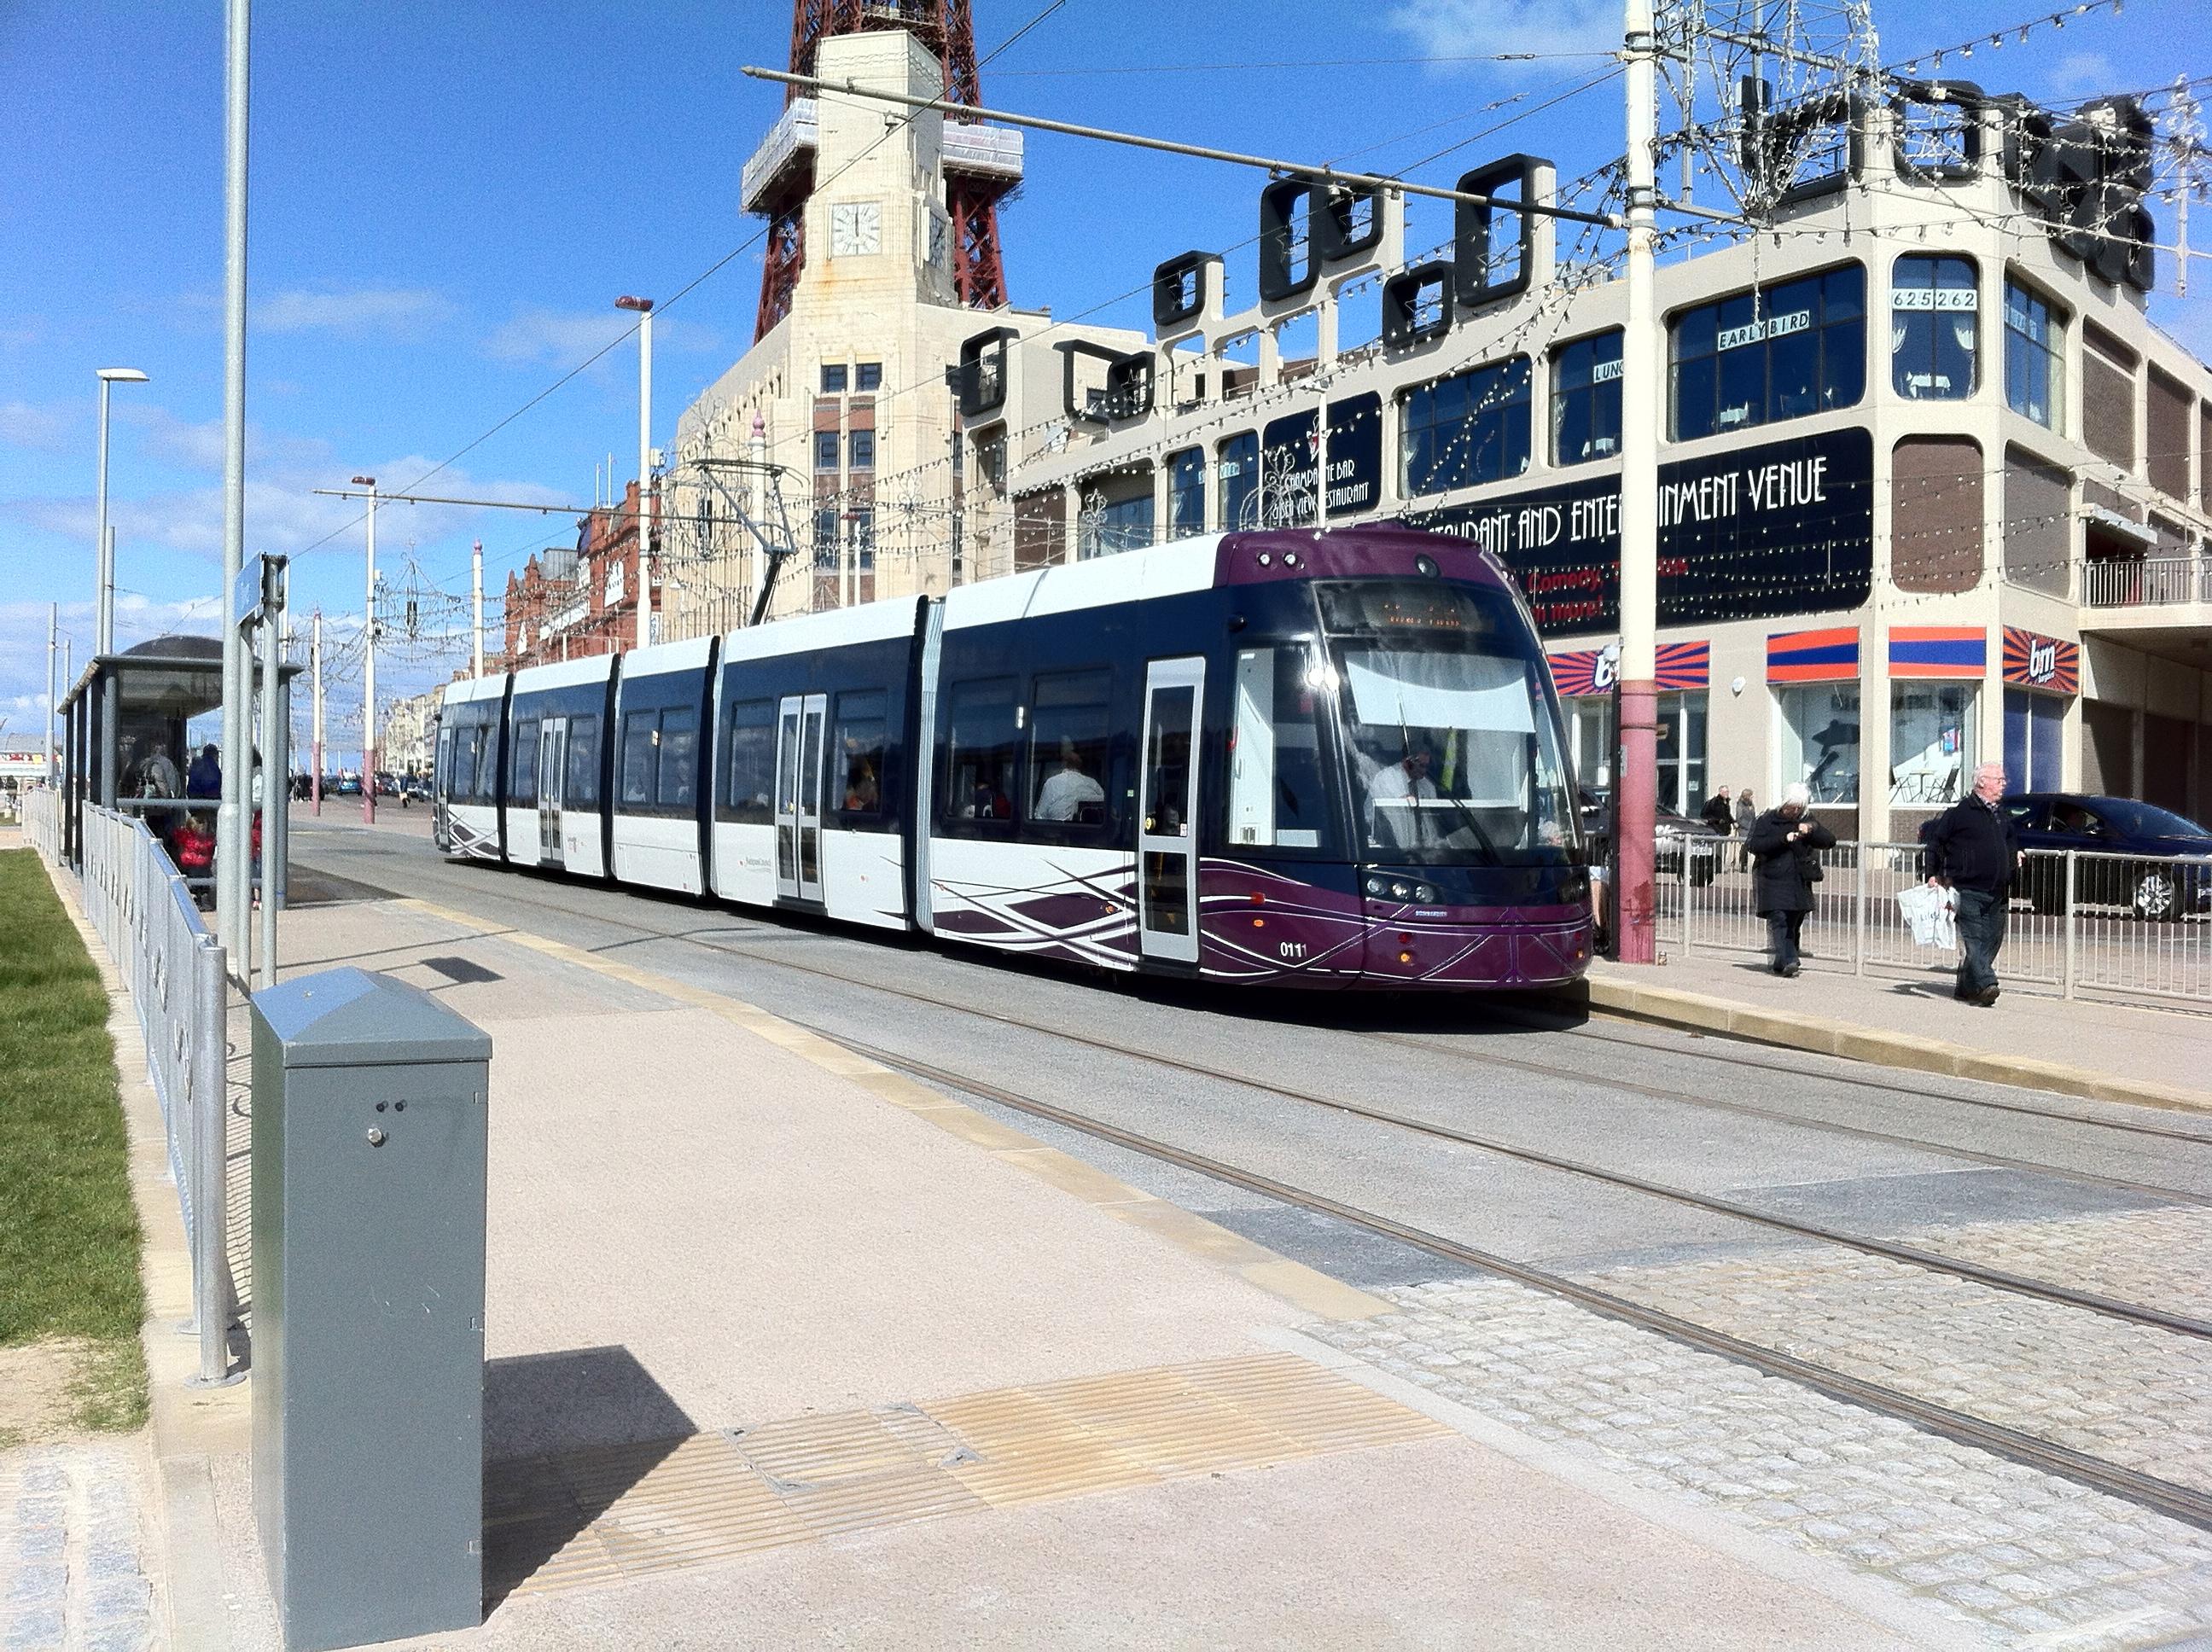 Flexity_2_(Blackpool)_tram_at_Tower_tram